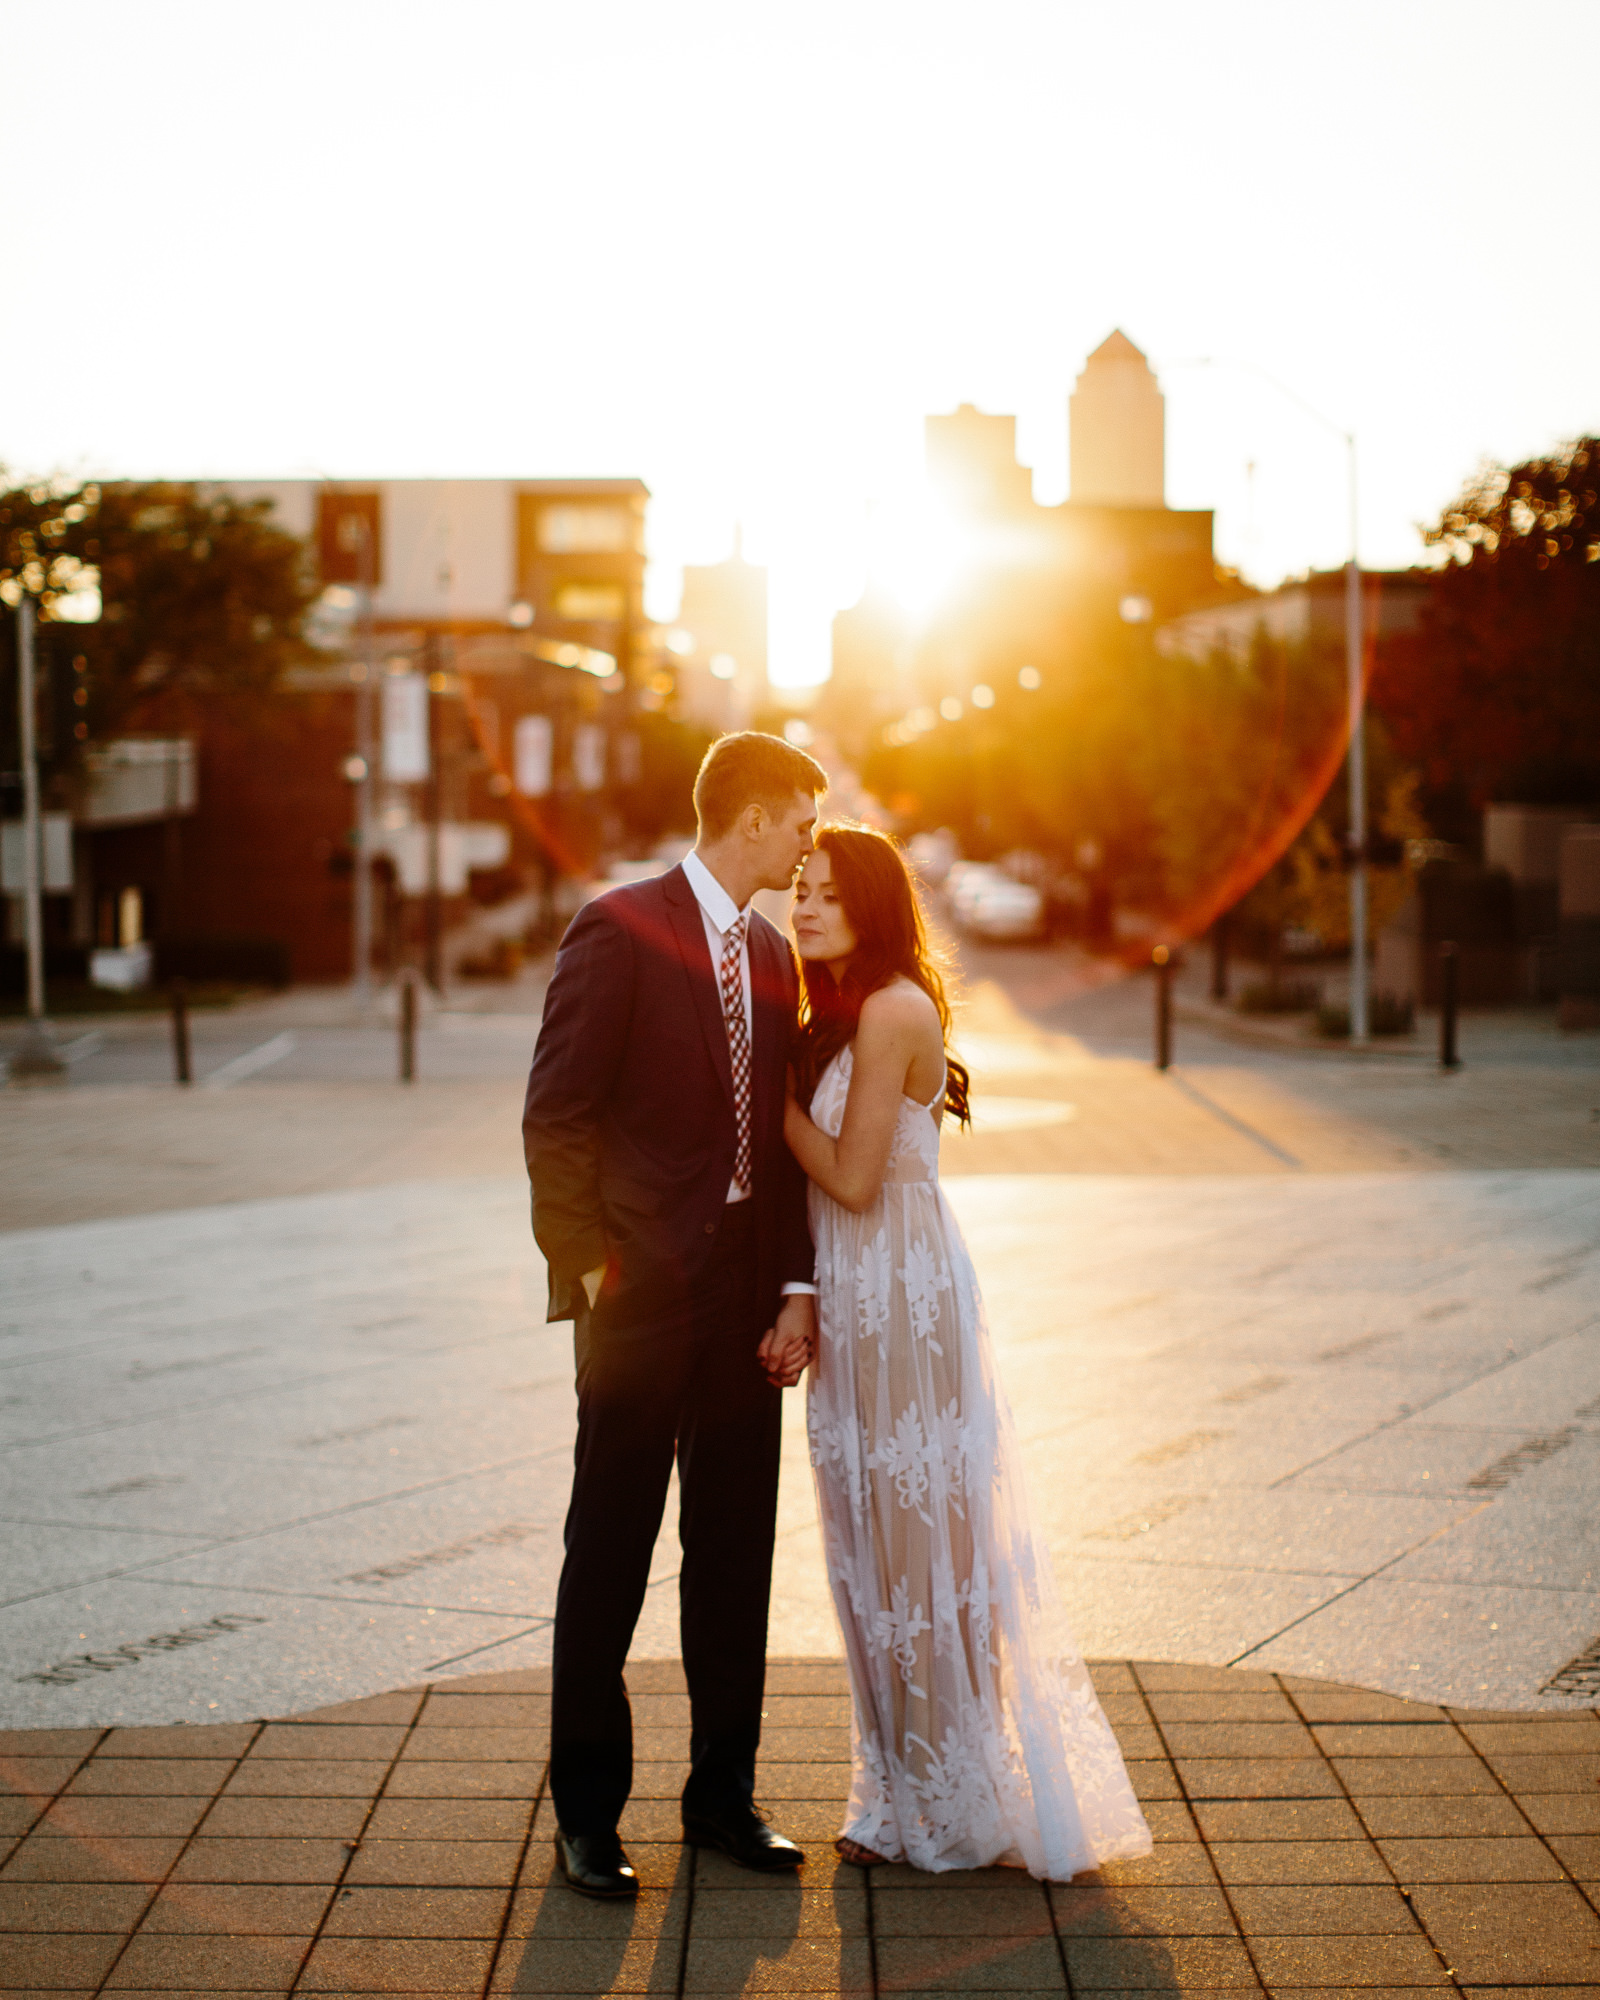 wedding-elopement-adventerous-romantic-timeless-des-moines-siouxfalls-photography-31.jpg